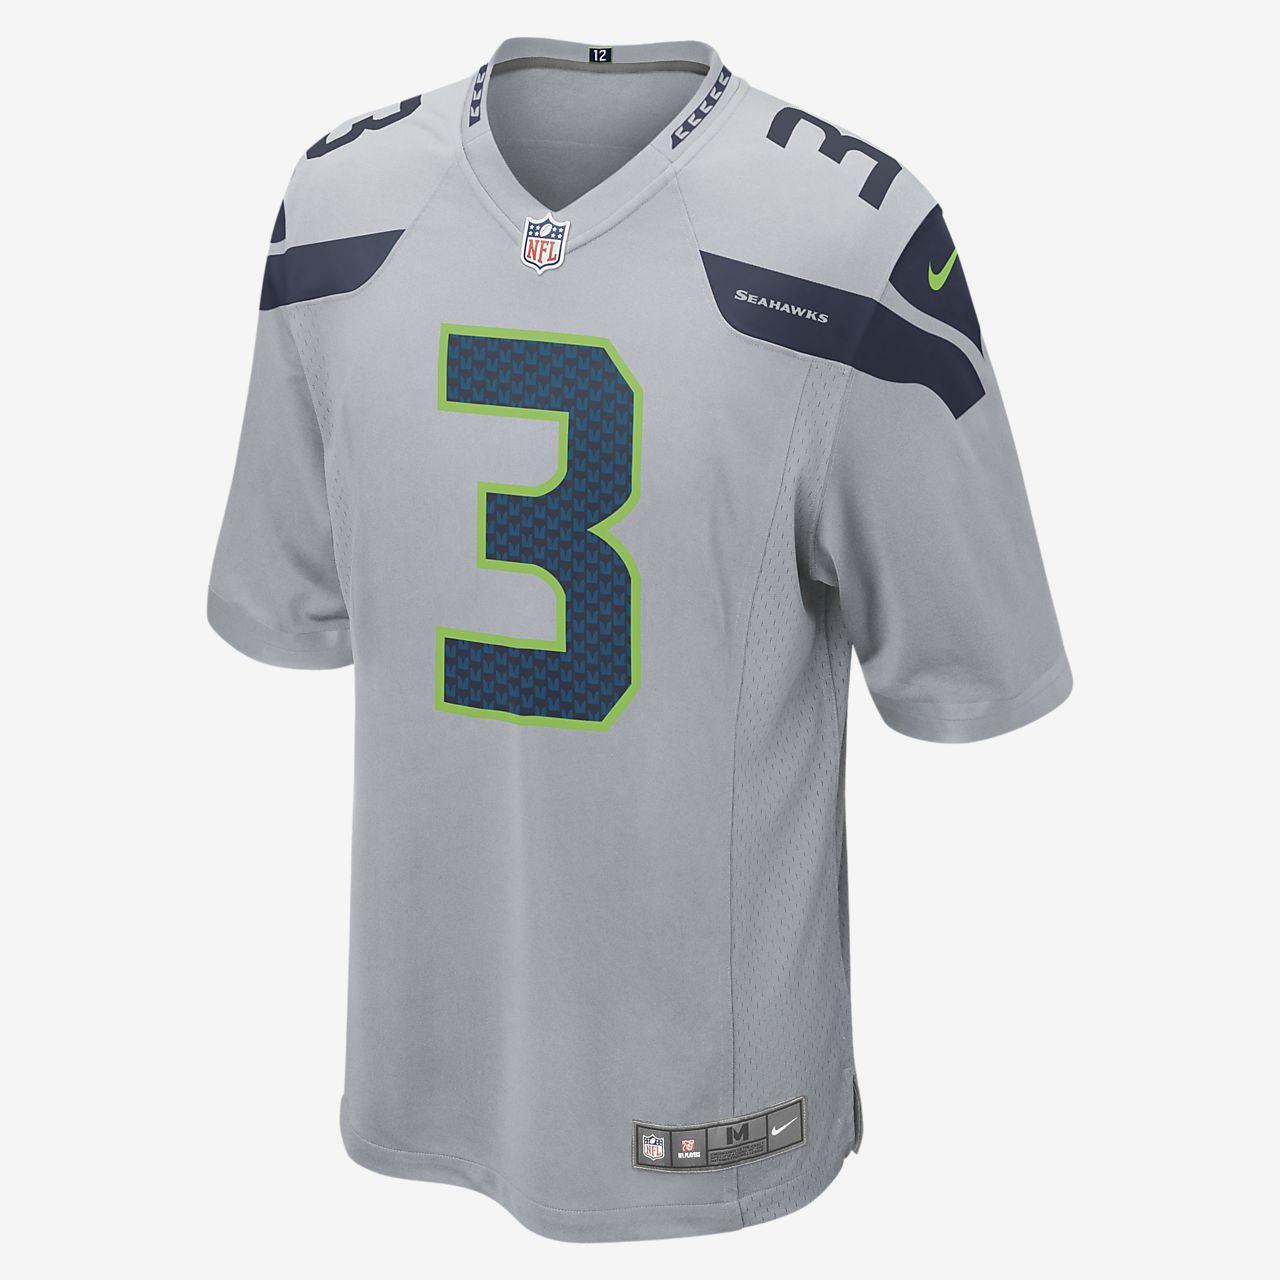 NFL Seattle Seahawks (Russell Wilson) Samarreta de futbol americà - Home